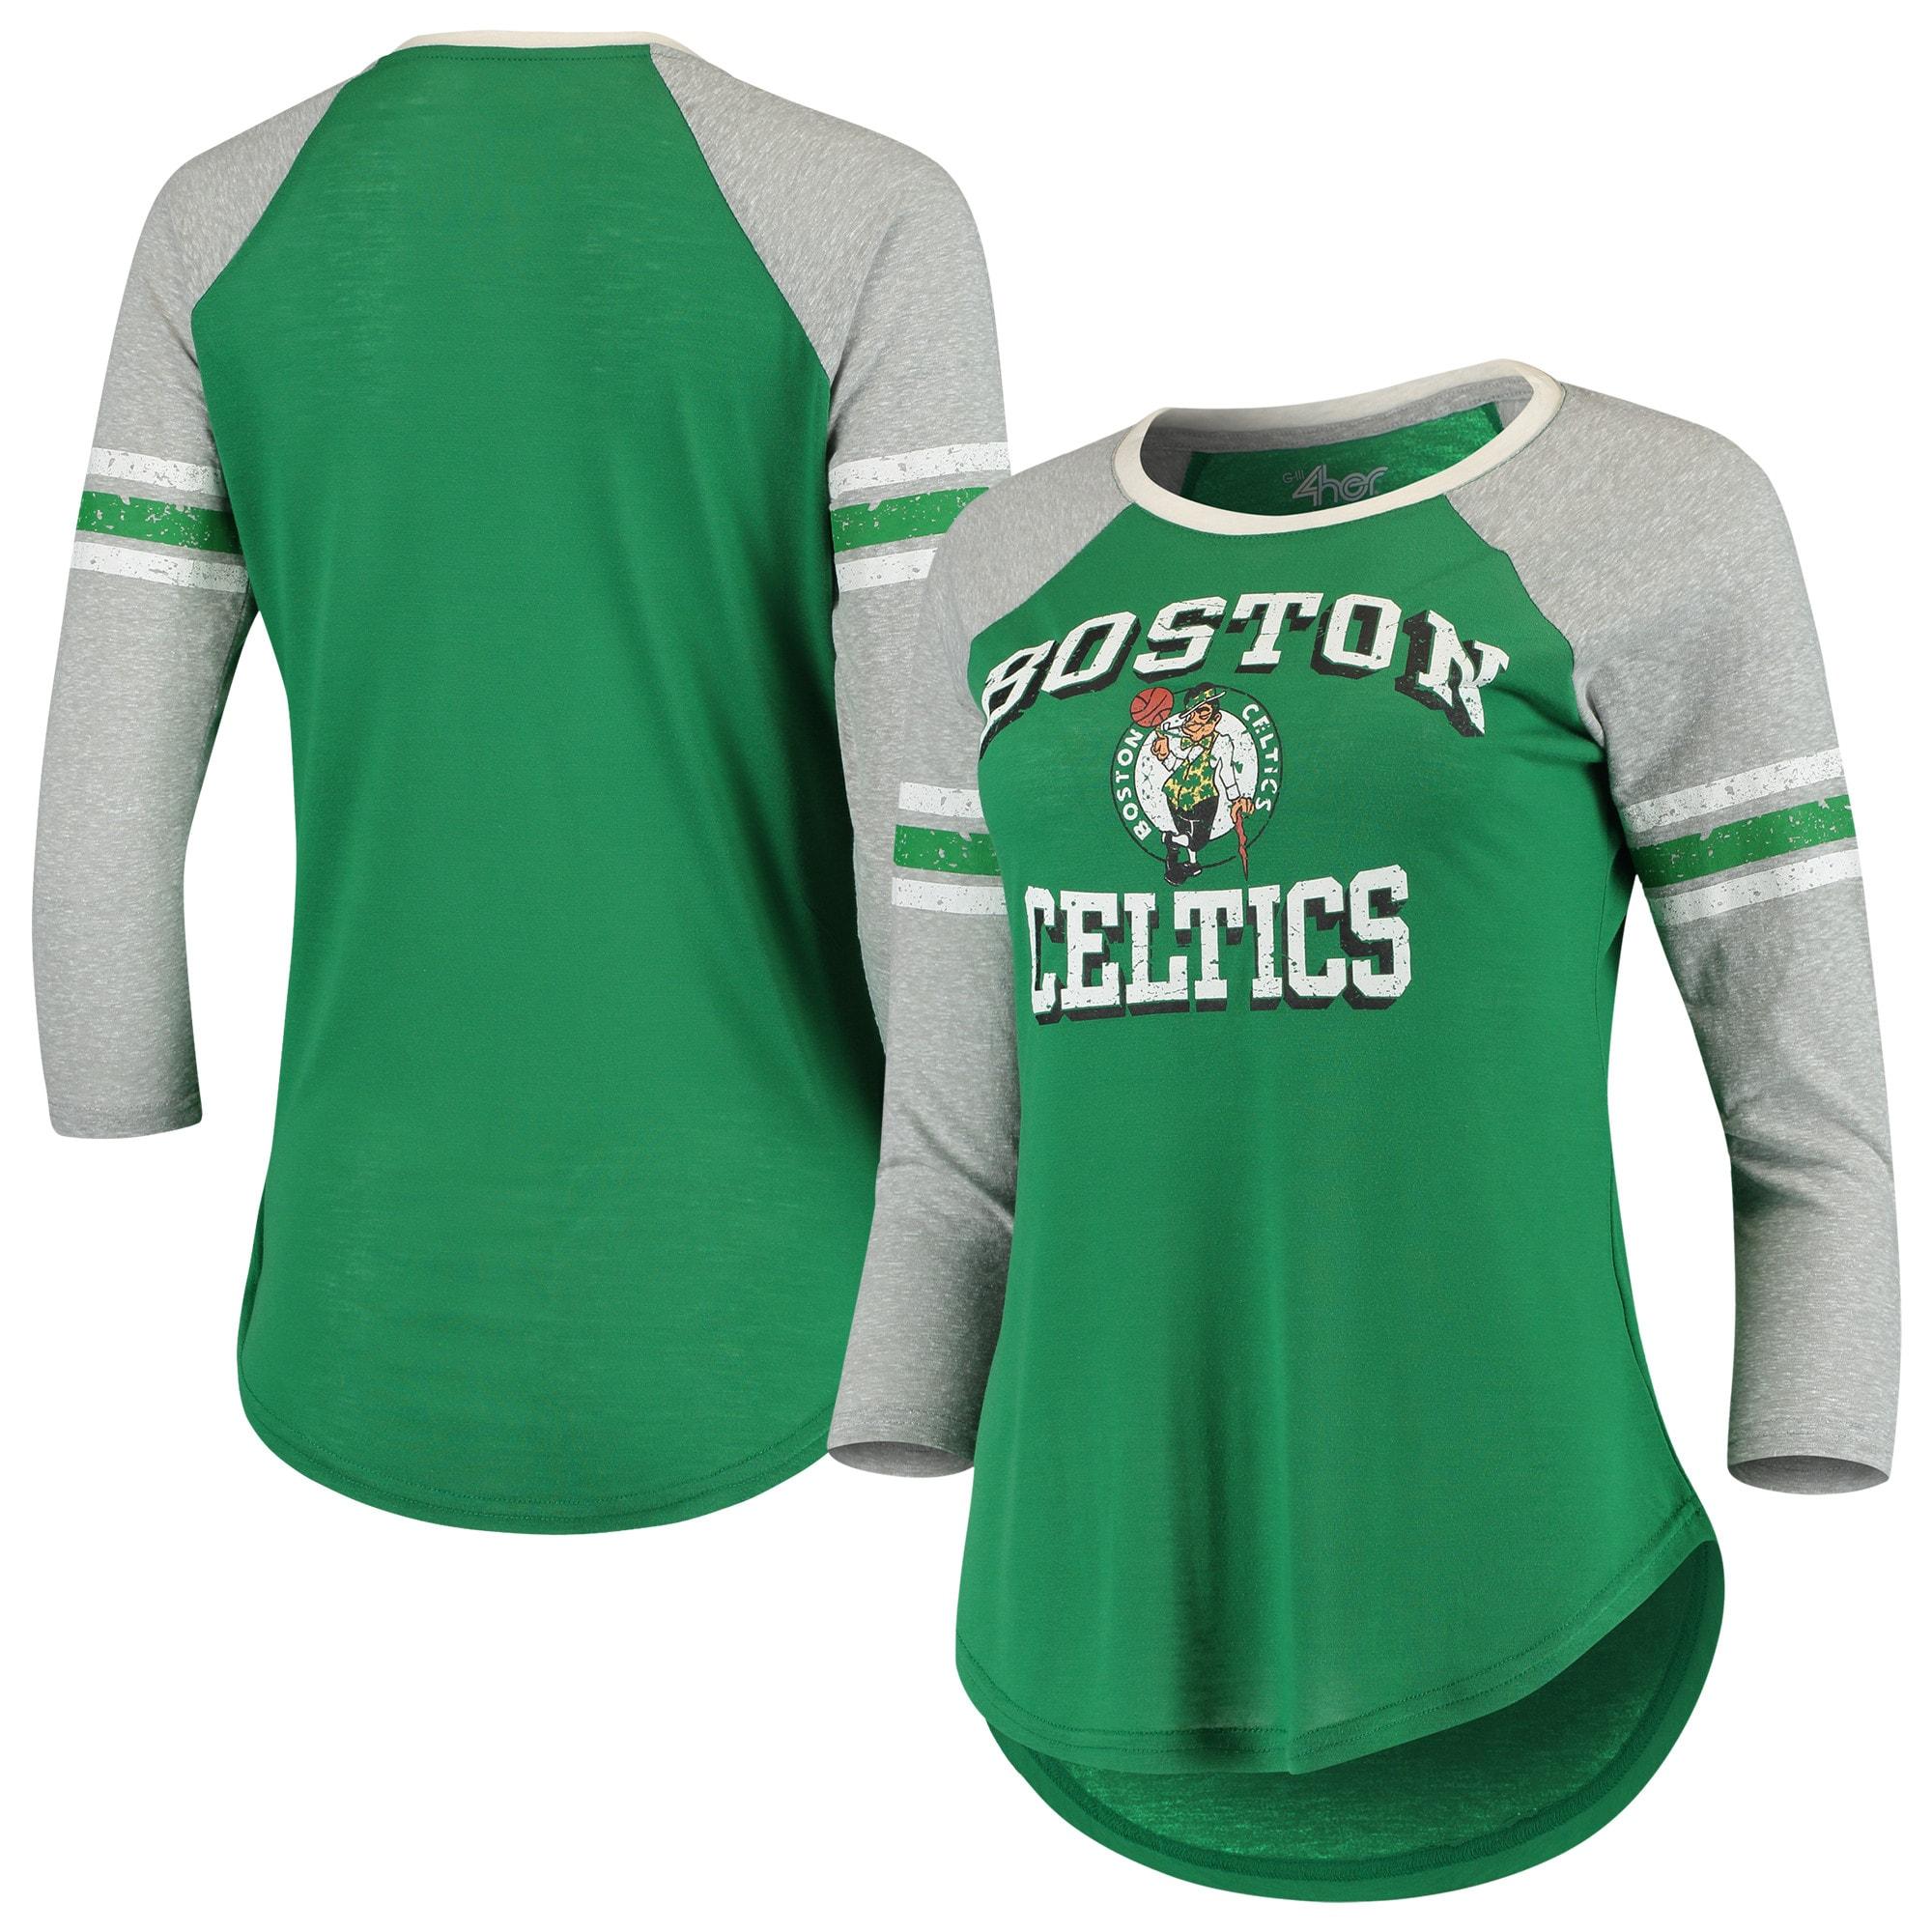 Boston Celtics G-III 4Her by Carl Banks Women's The Court Tri-Blend Raglan 3/4-Sleeve T-Shirt - Kelly Green/Heathered Gray